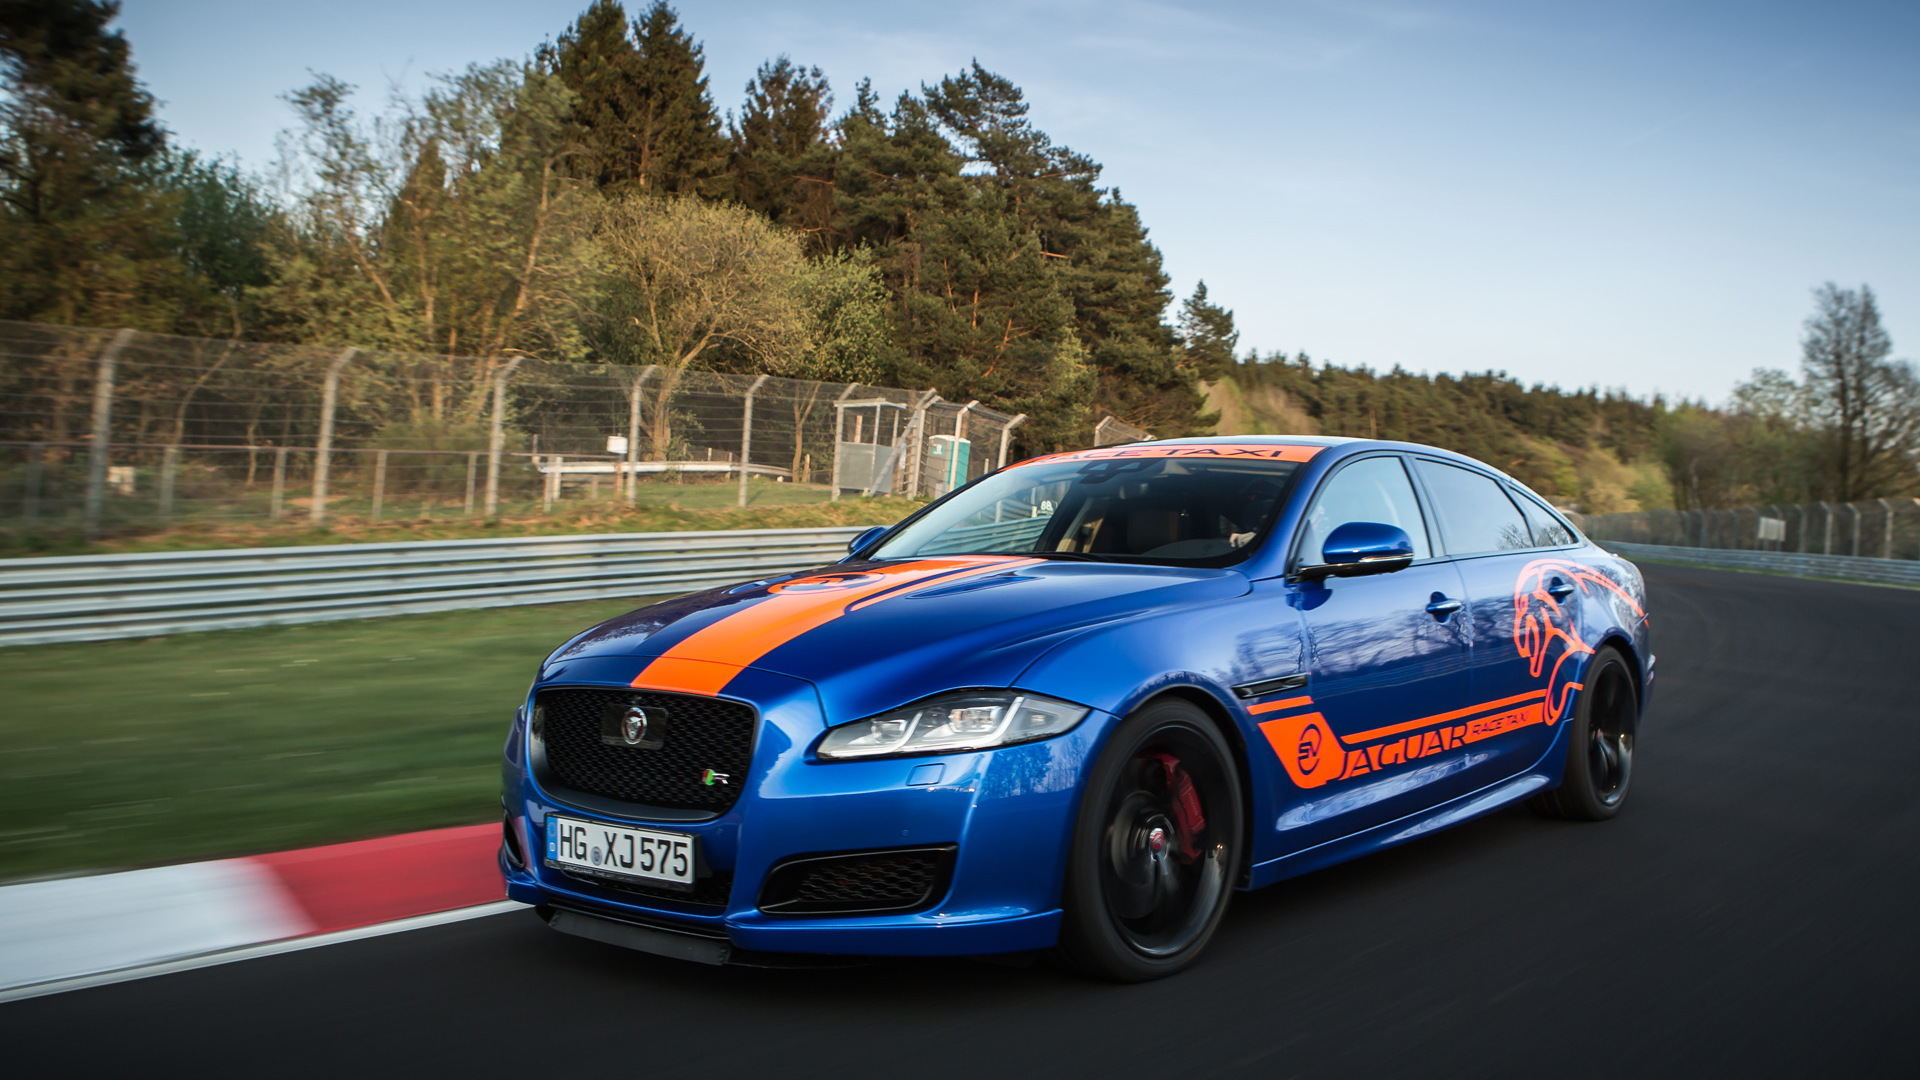 2018 Jaguar XJR575 Nürburgring Race Taxi